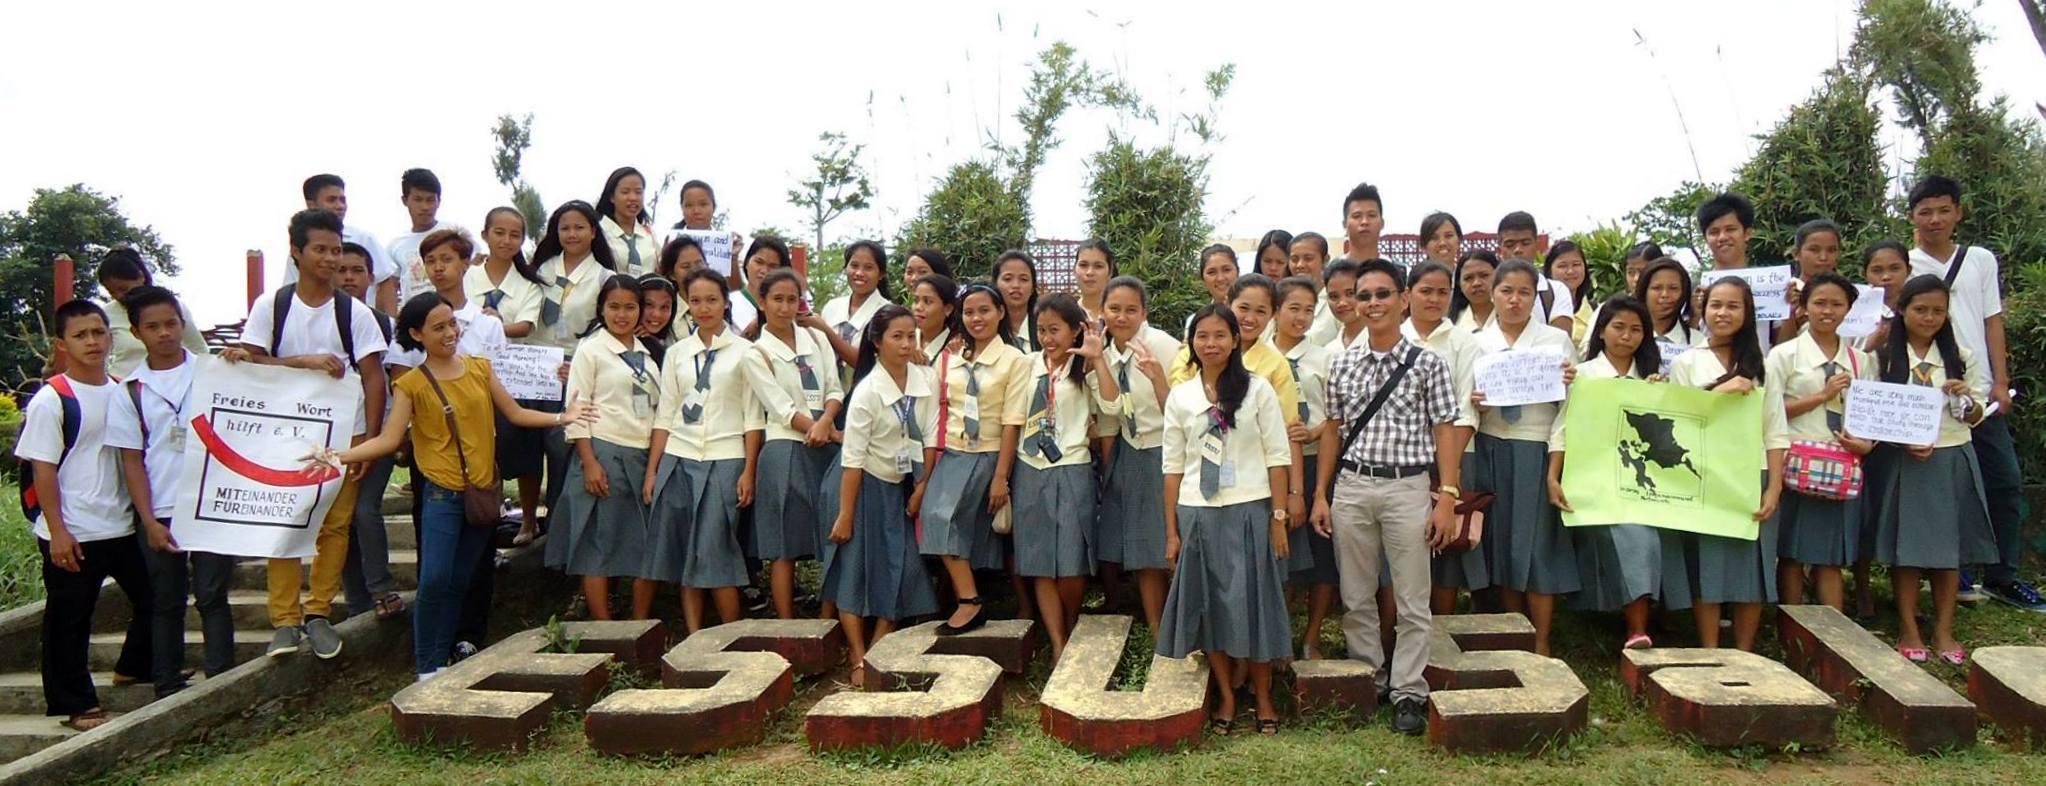 05/2015: Third semester of WEN-scholarship at the ESSU Salcedo